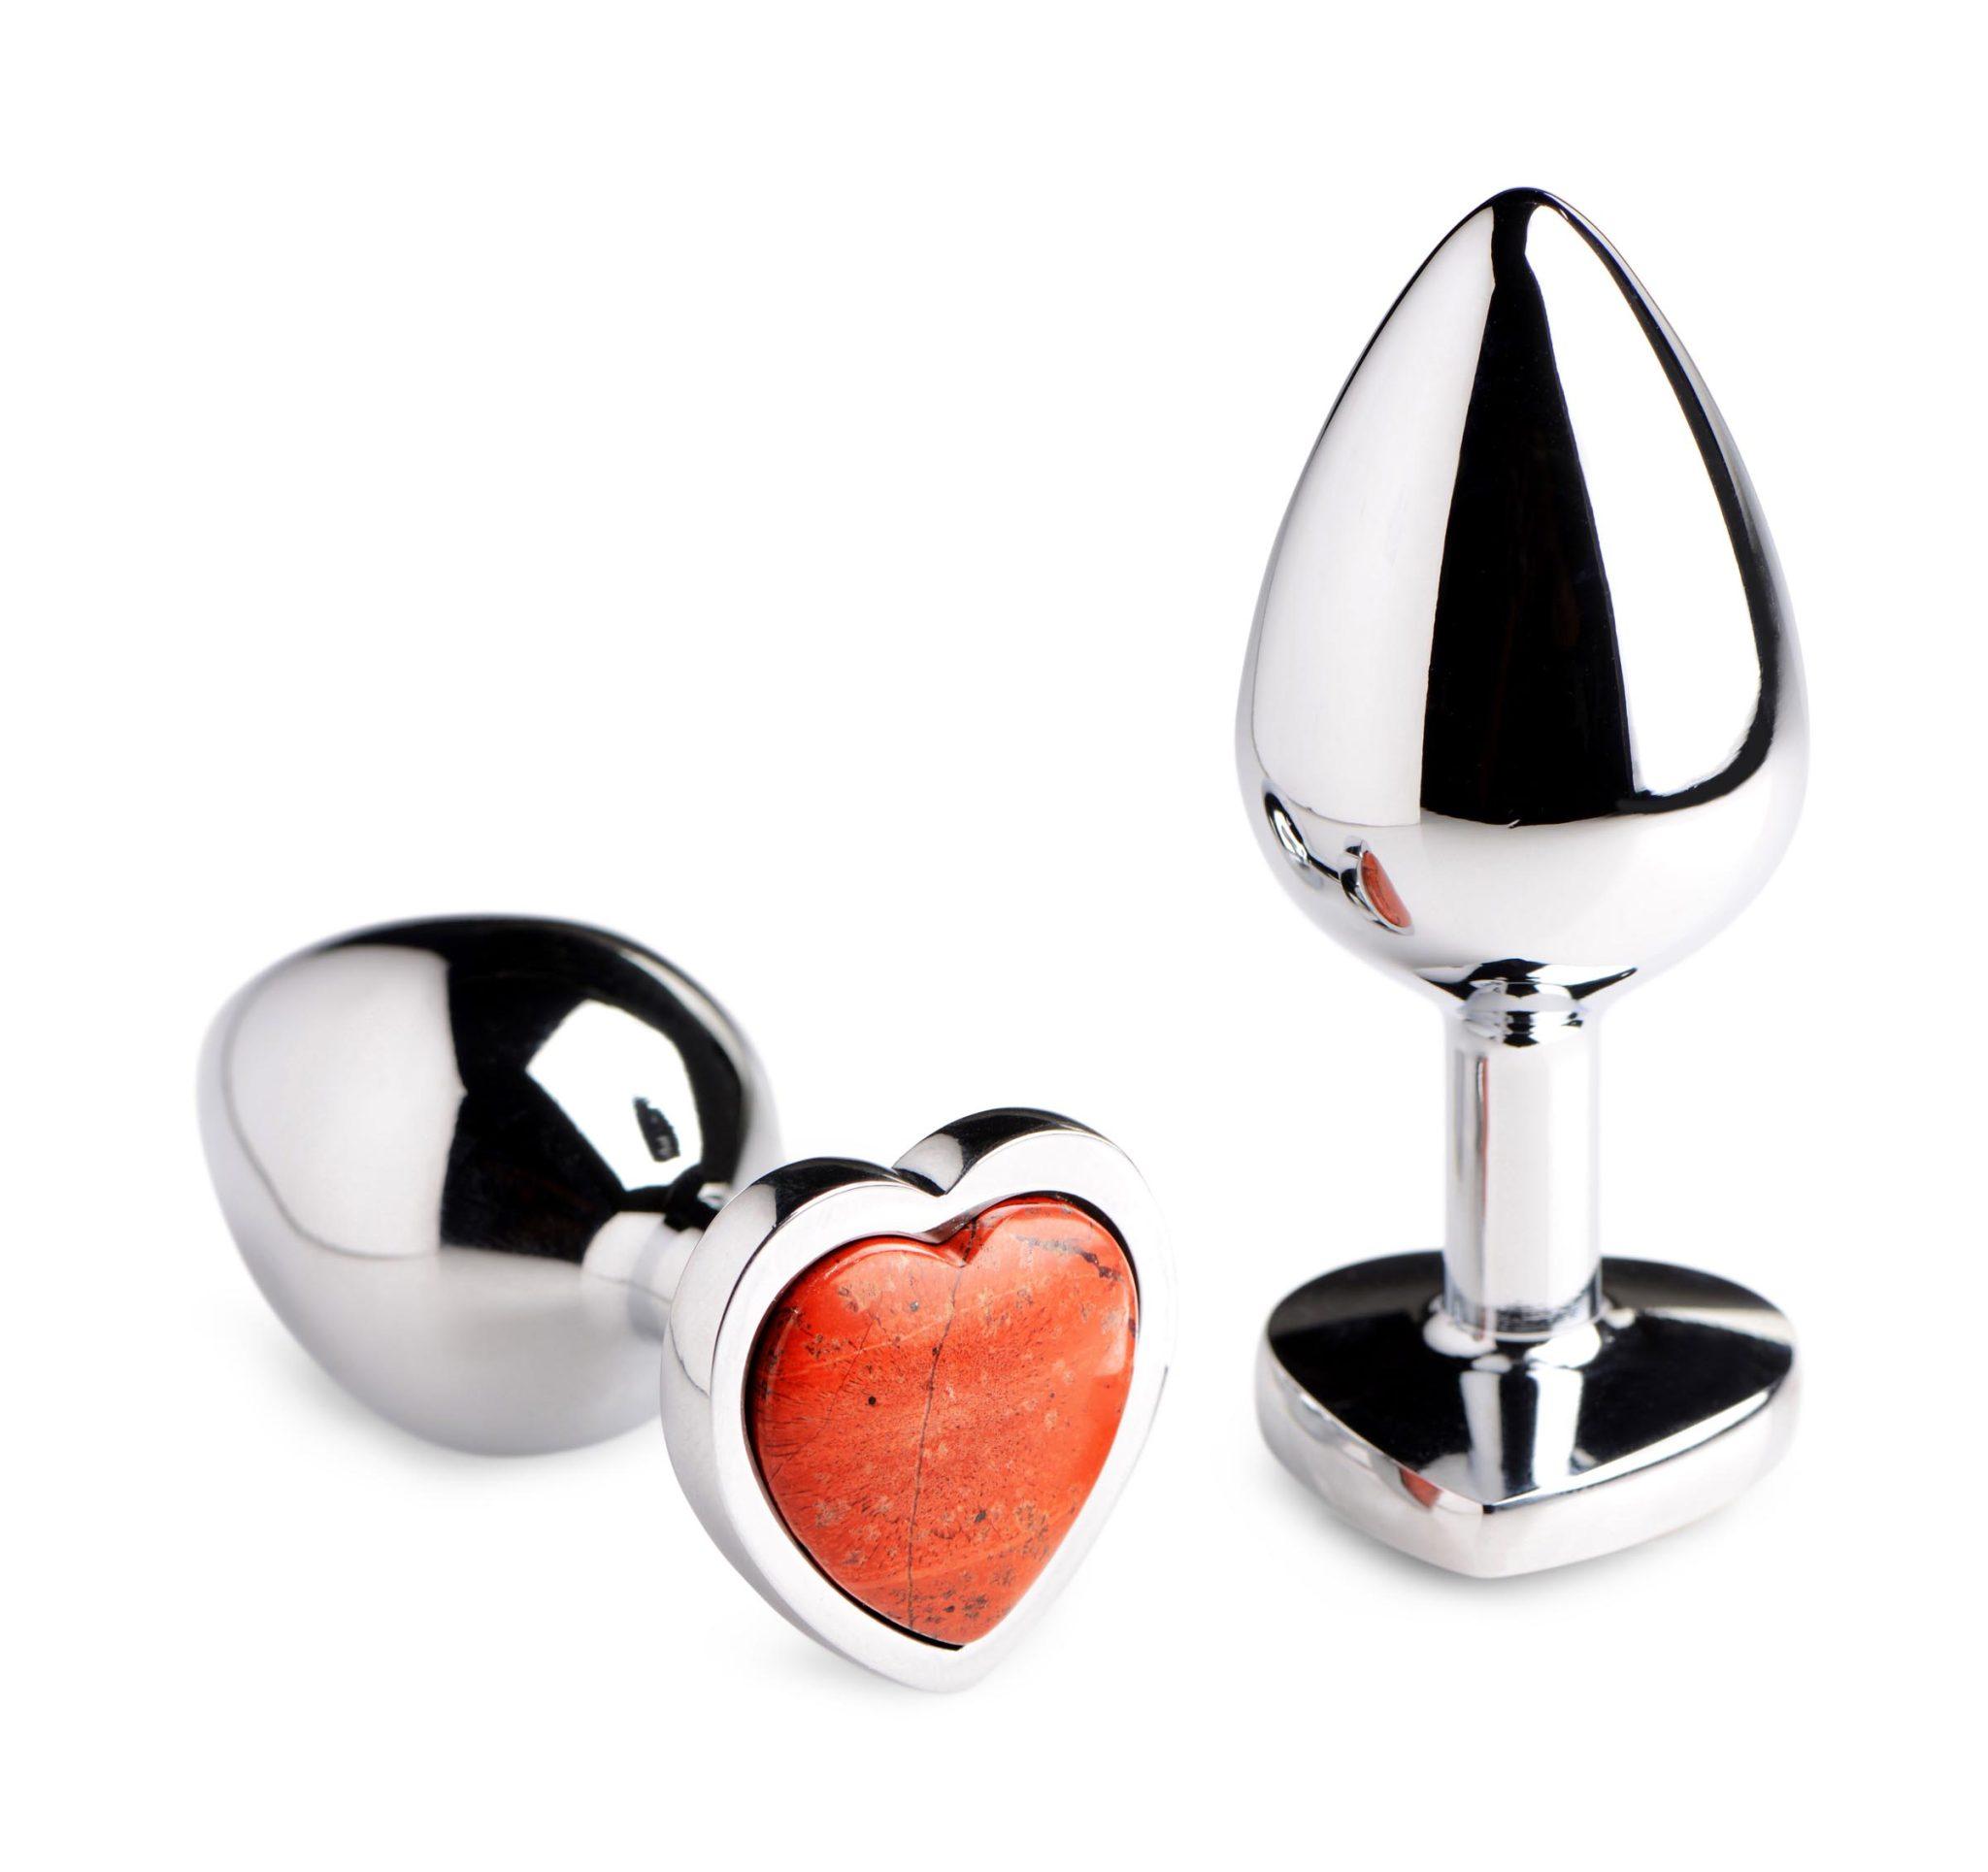 Authentic Red Jasper Gemstone Heart Anal Plug – Small